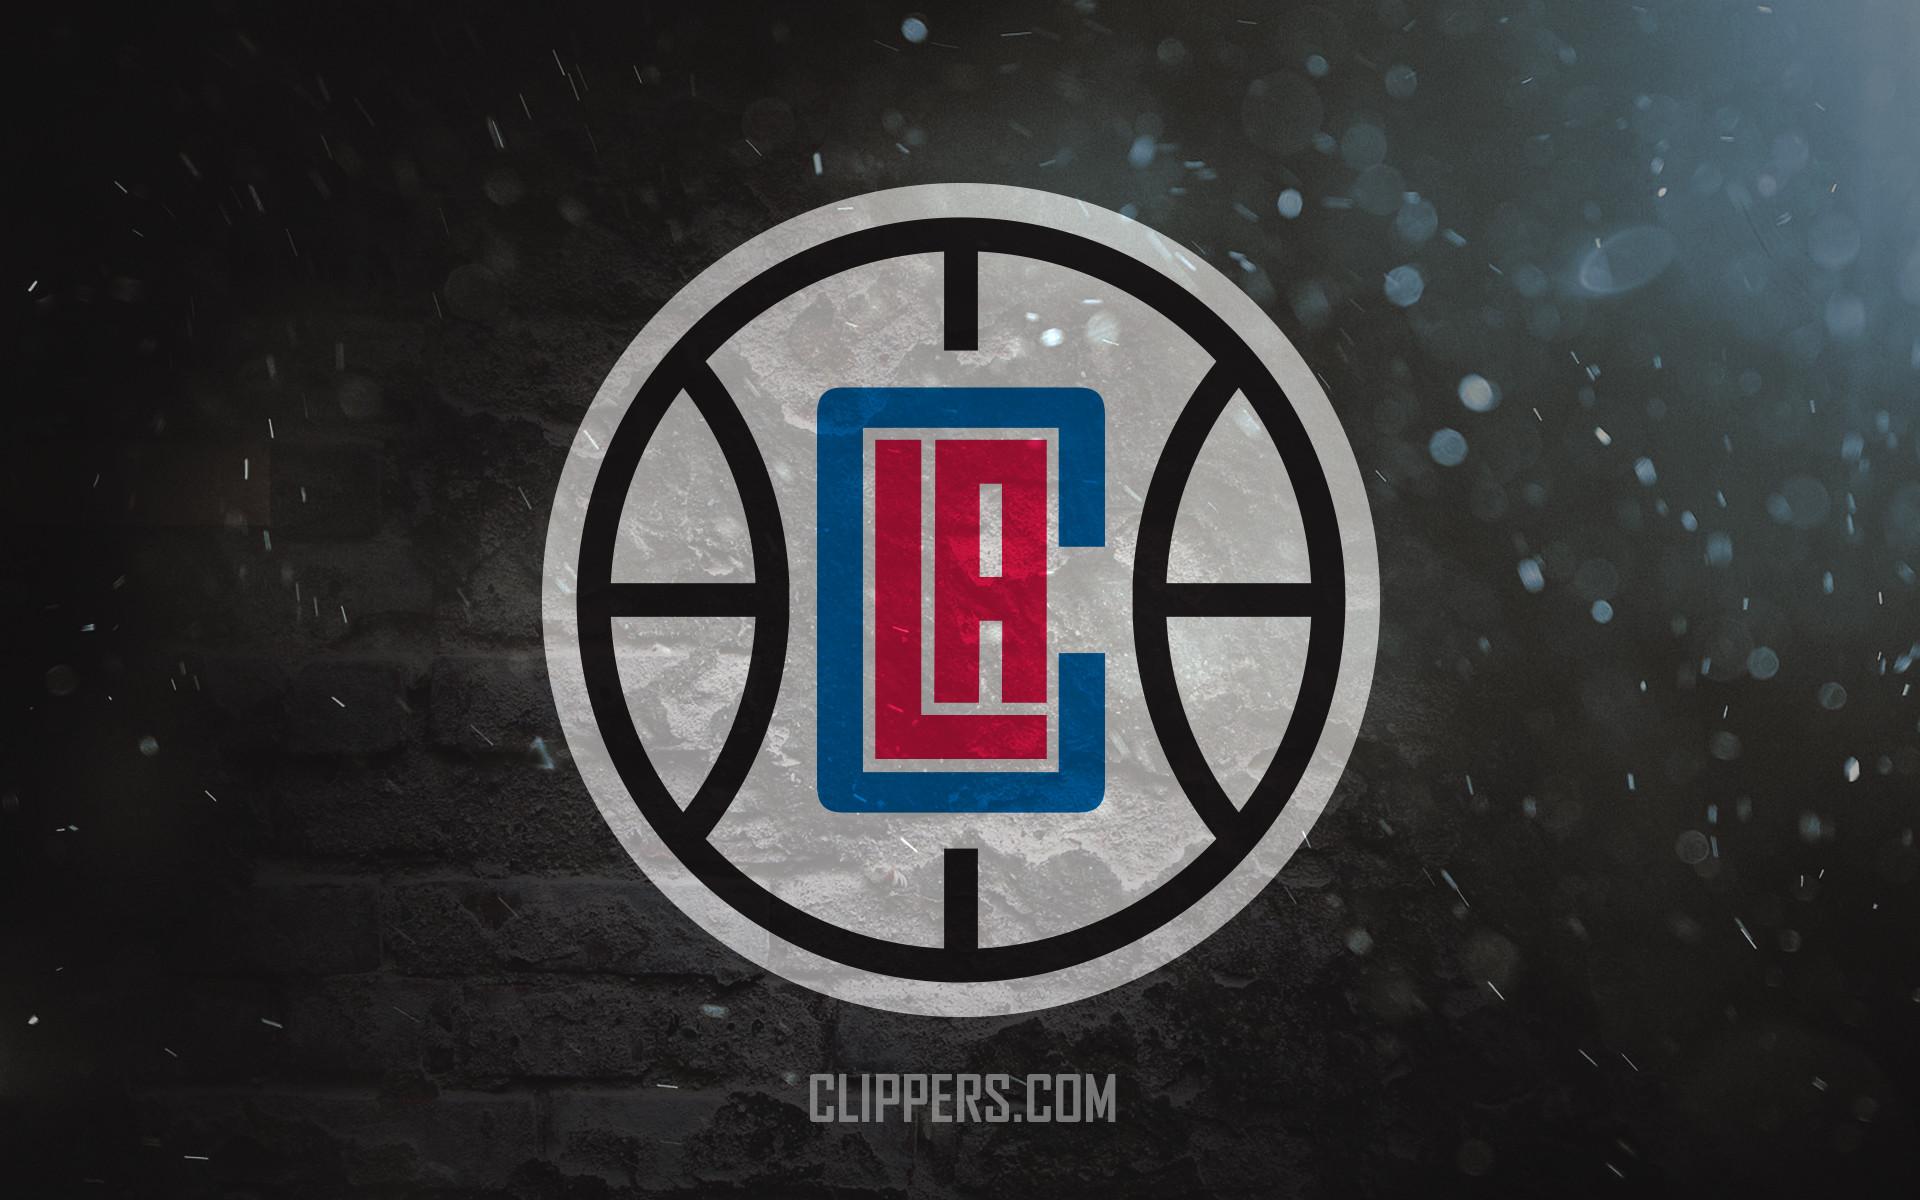 Claim Your Court | LA Clippers